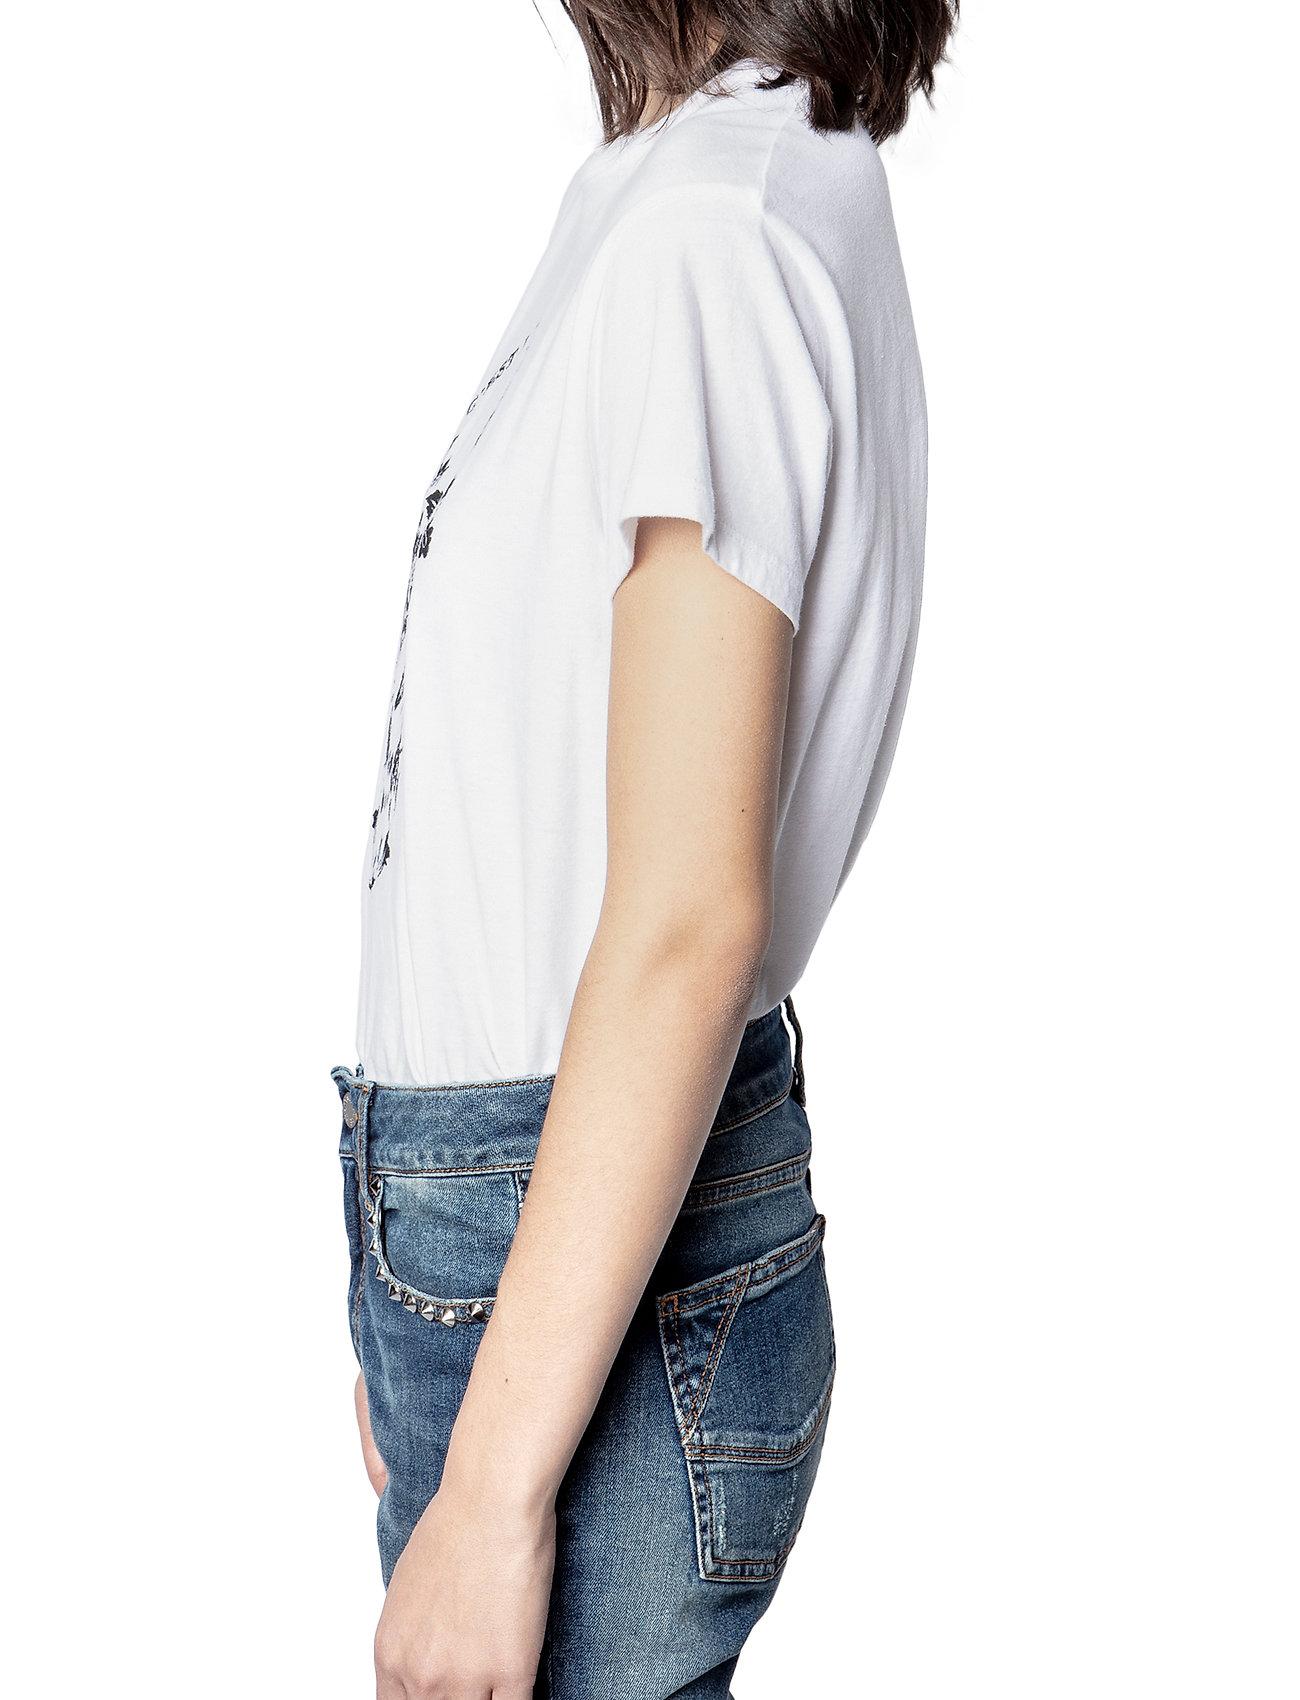 Zadig & Voltaire - ZOE SKULL VOLTAIRE COTTON T-SHIRT PRINT/ EMBROIDER - t-shirts - white - 5